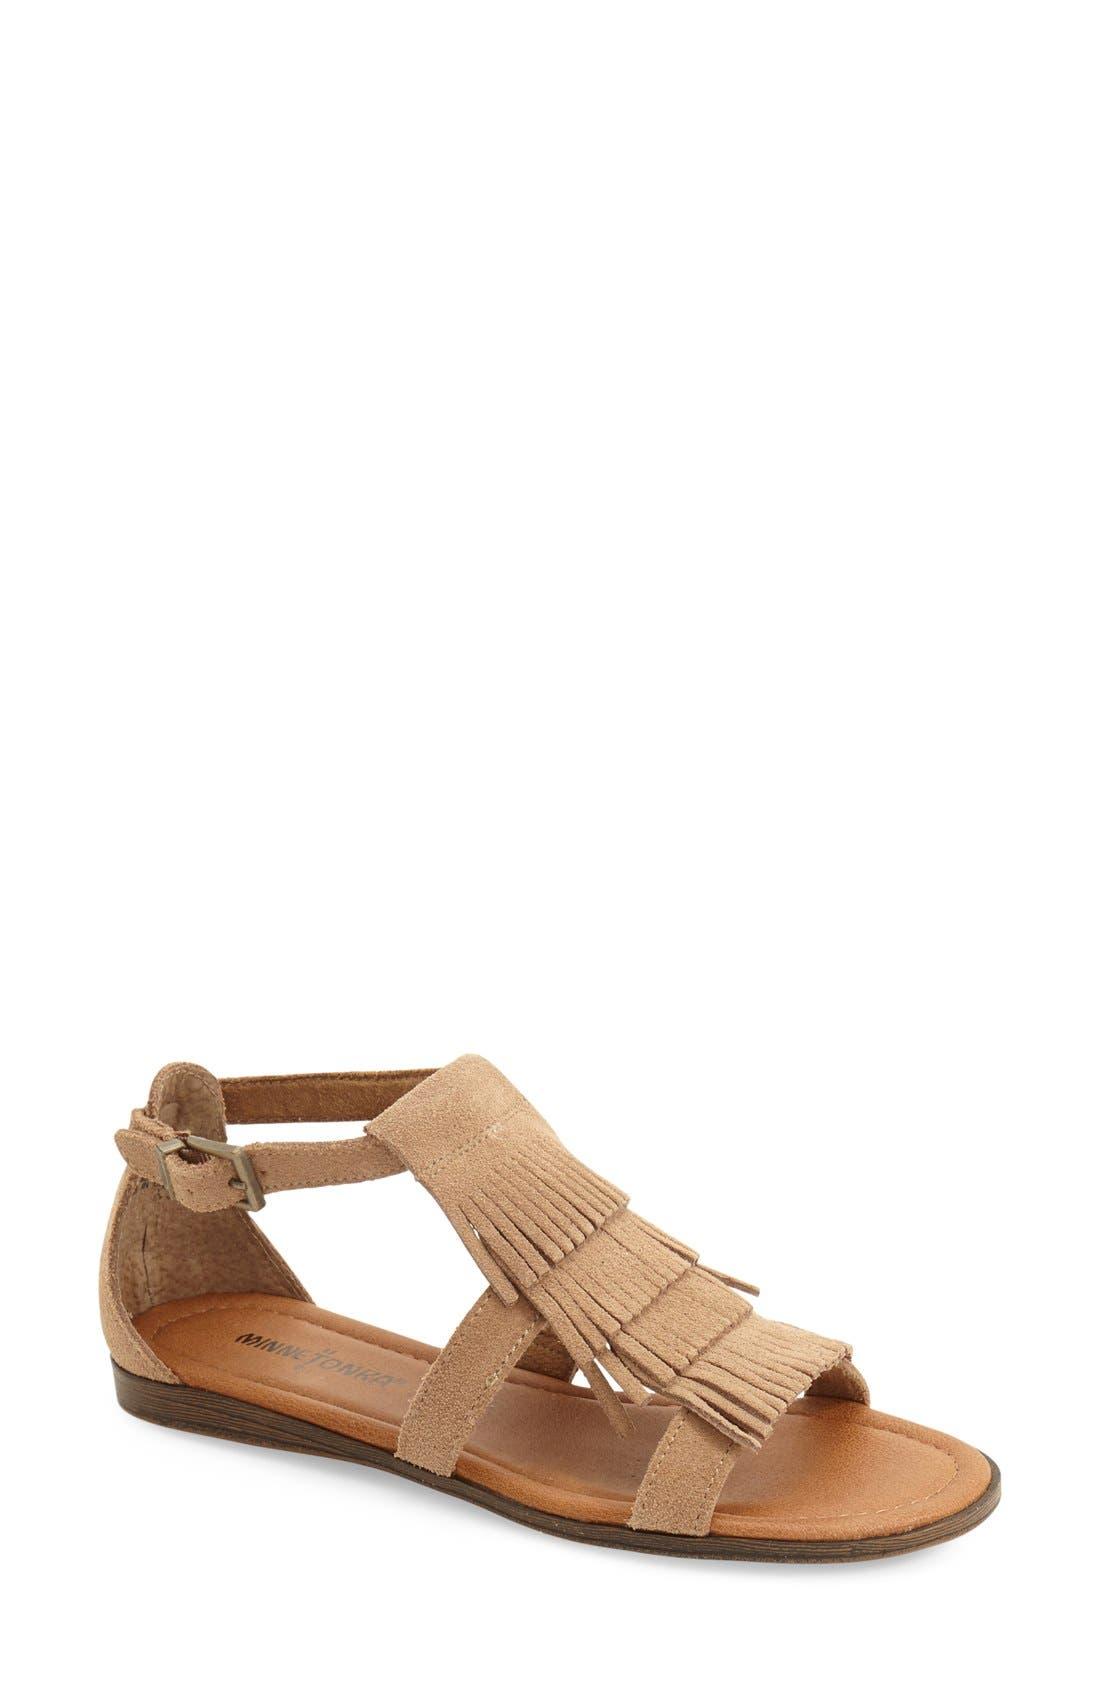 Main Image - Minnetonka 'Maui' Sandal